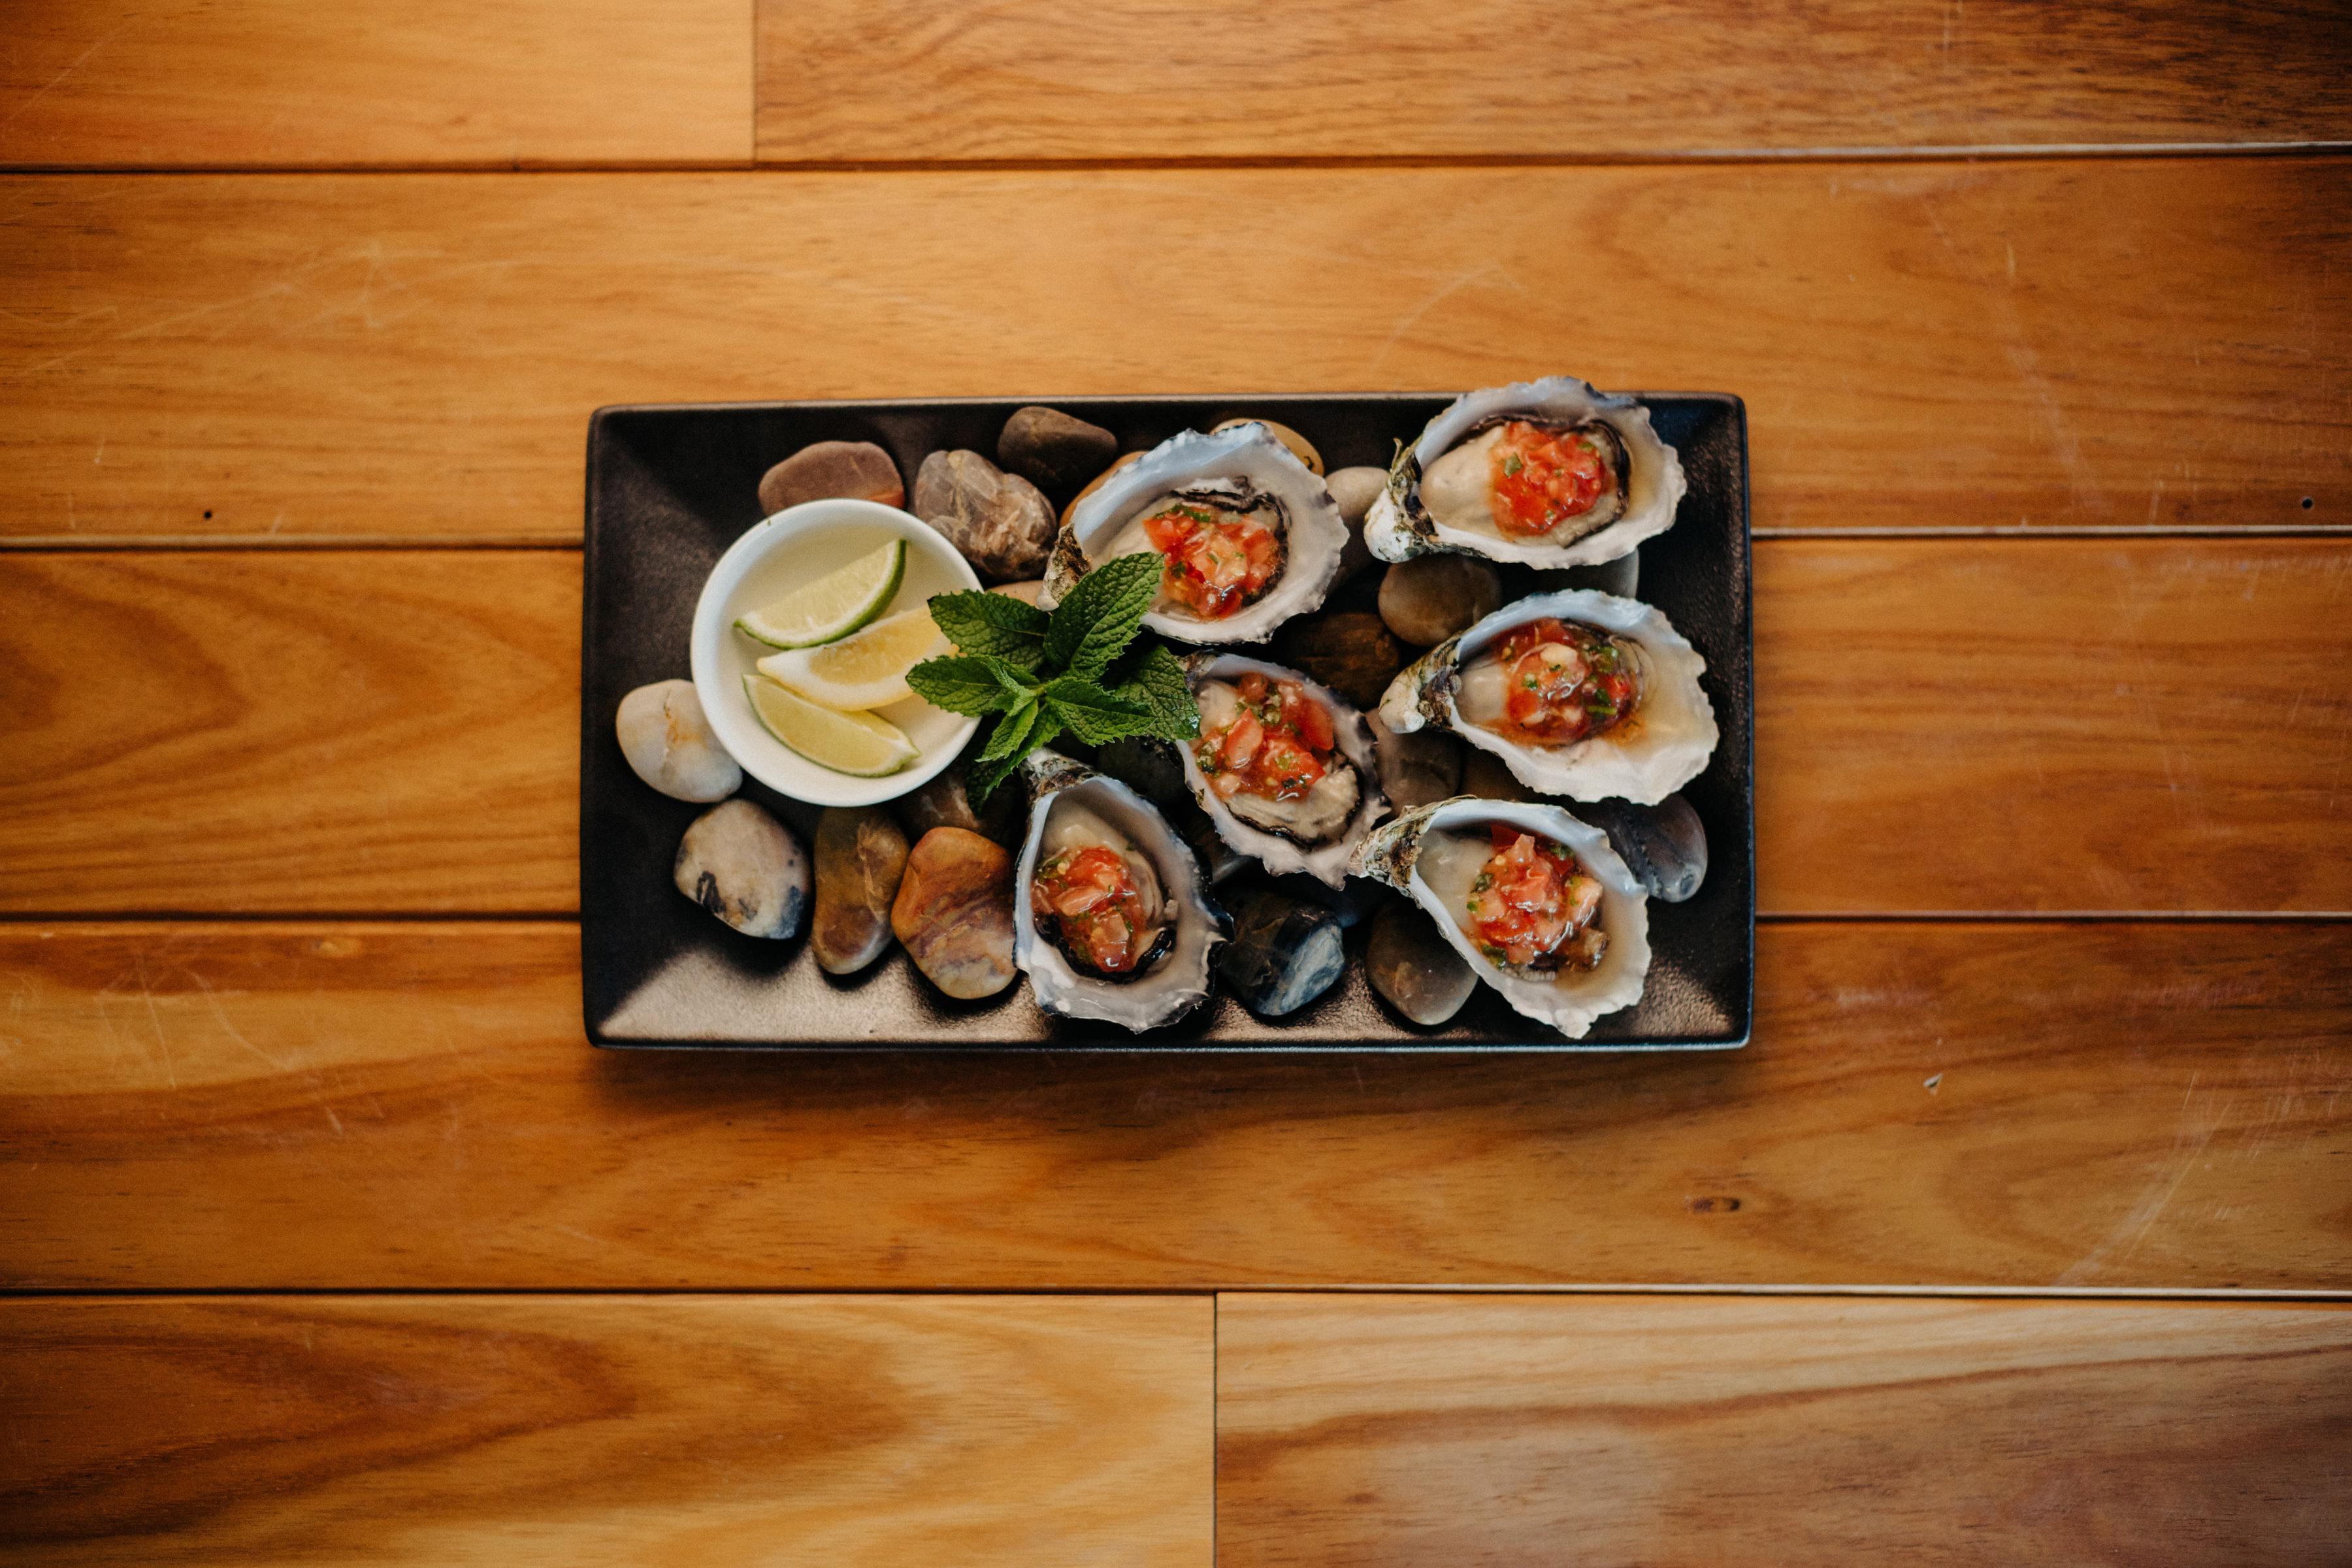 Tarkine-fresh-oyster-Andy-74